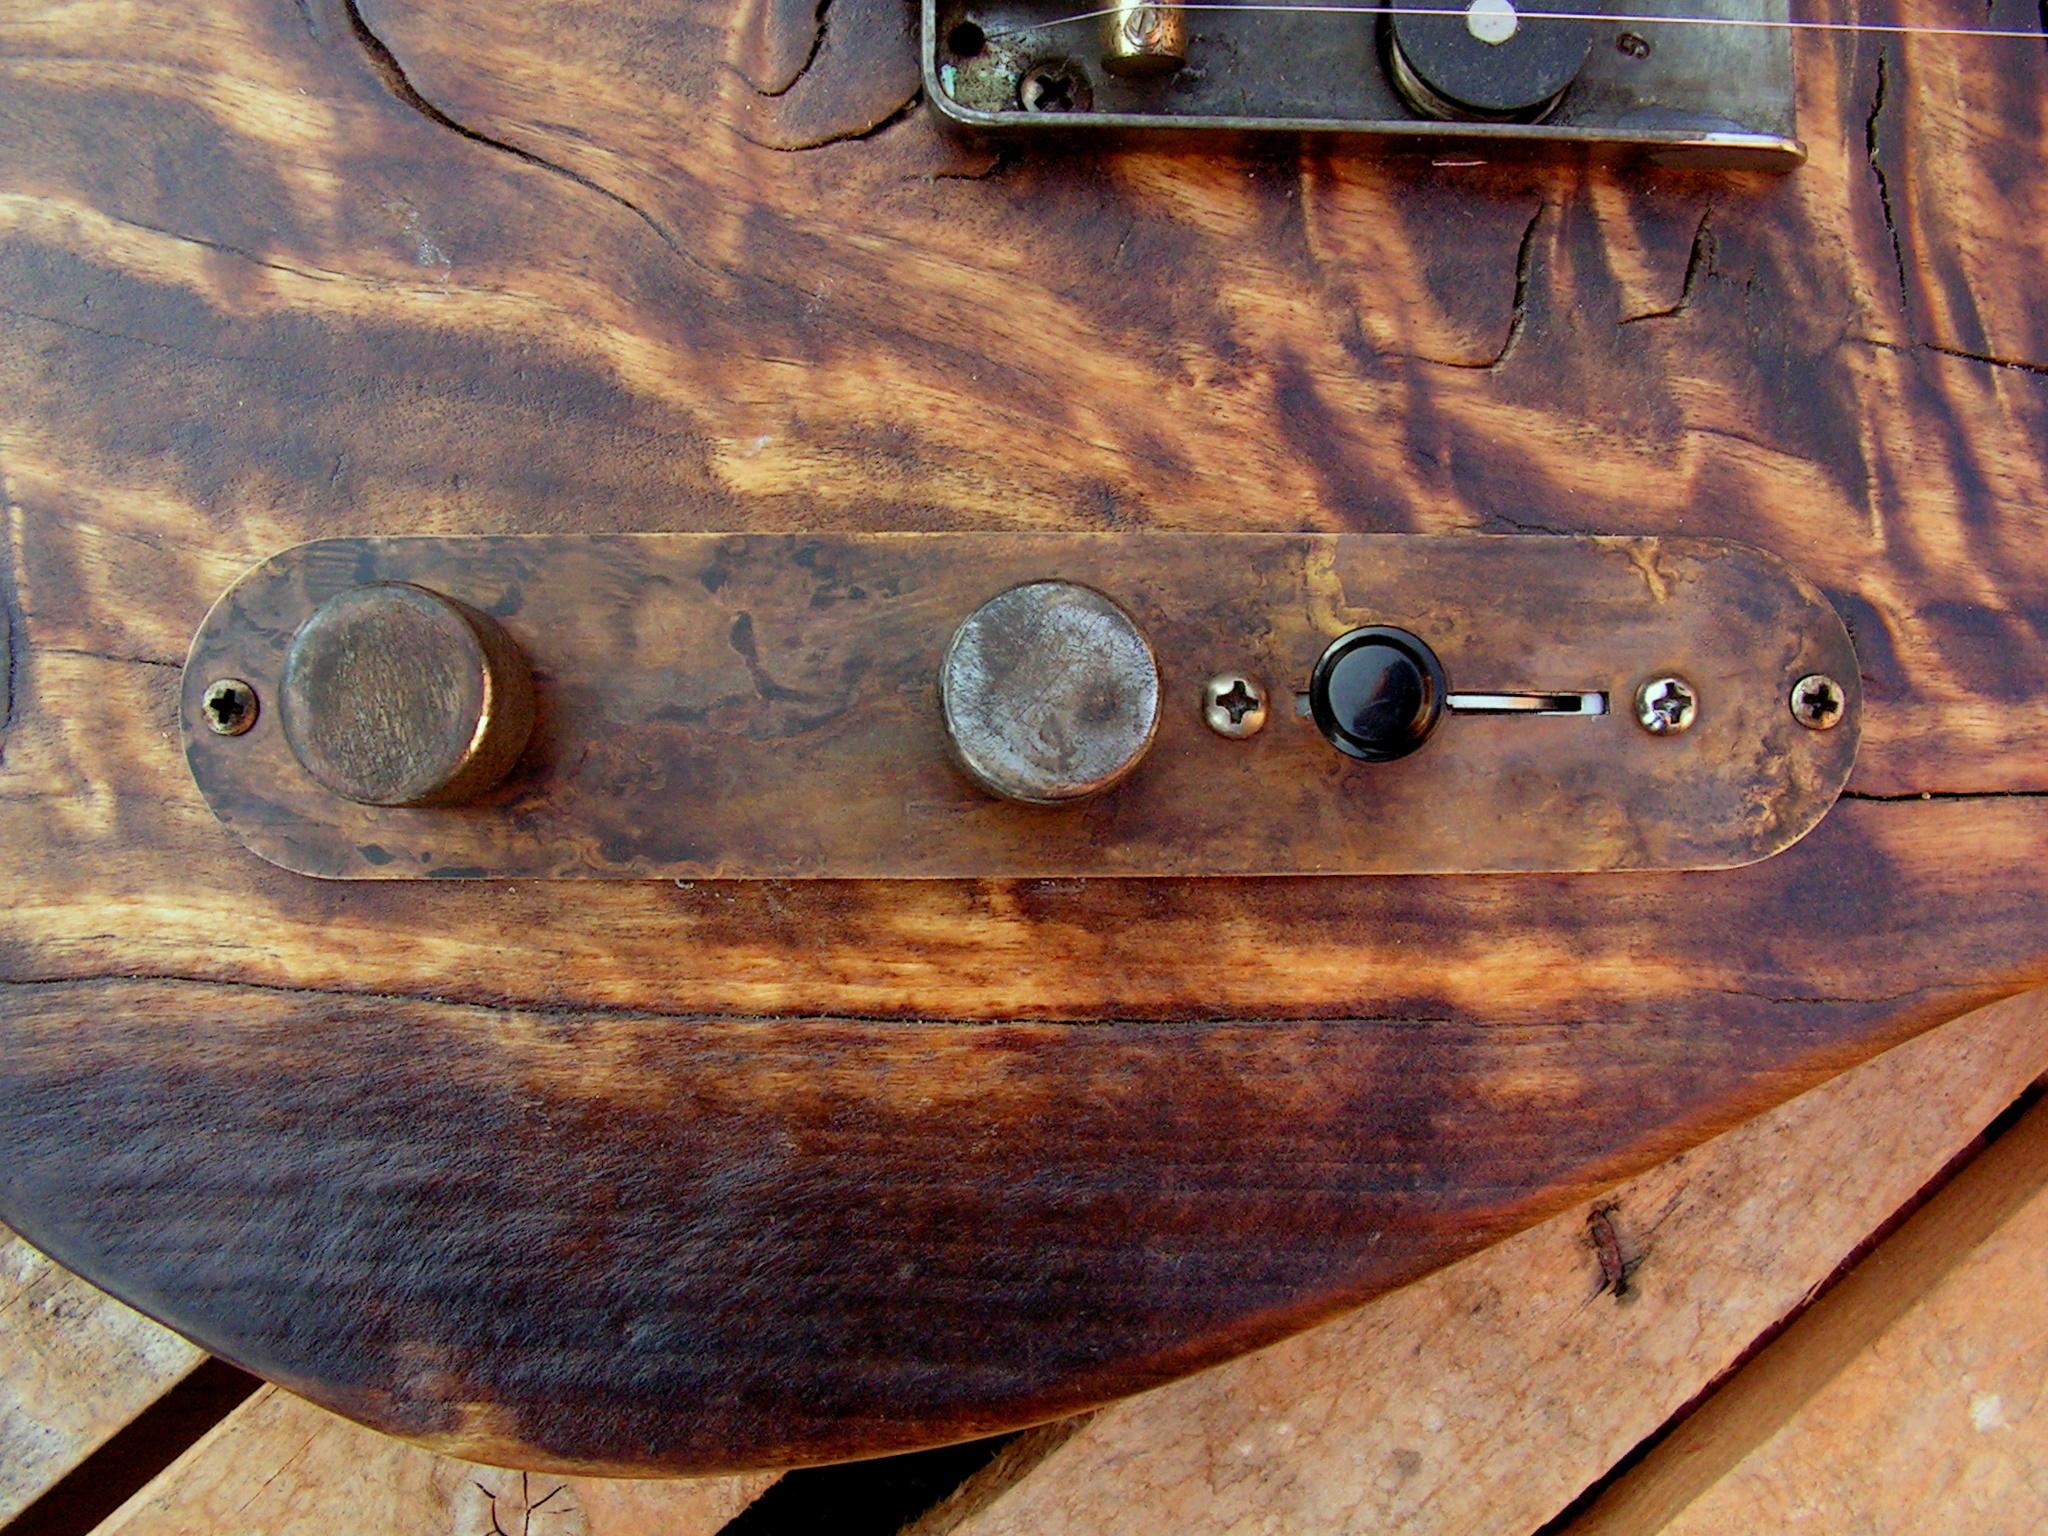 Chitarra elettrica Telecaster in pioppo secolare